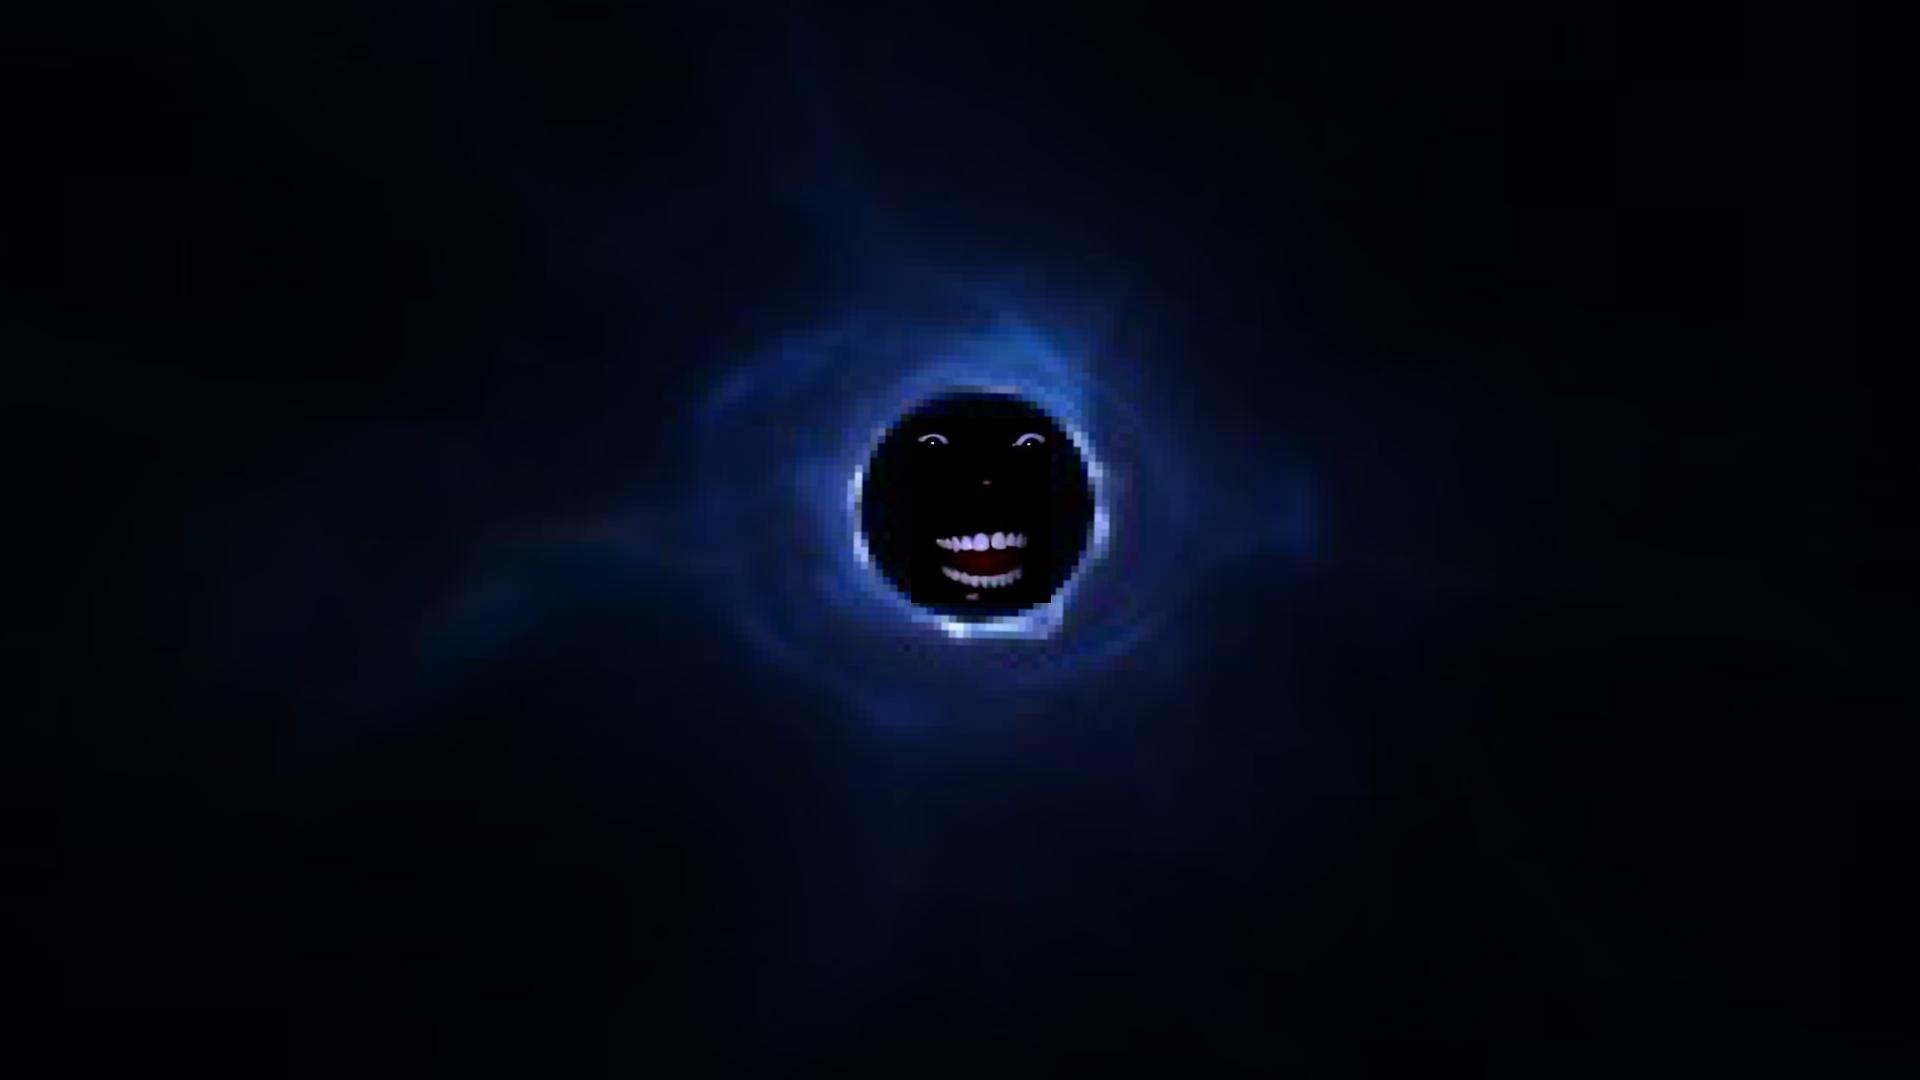 El agujero de fornais - meme